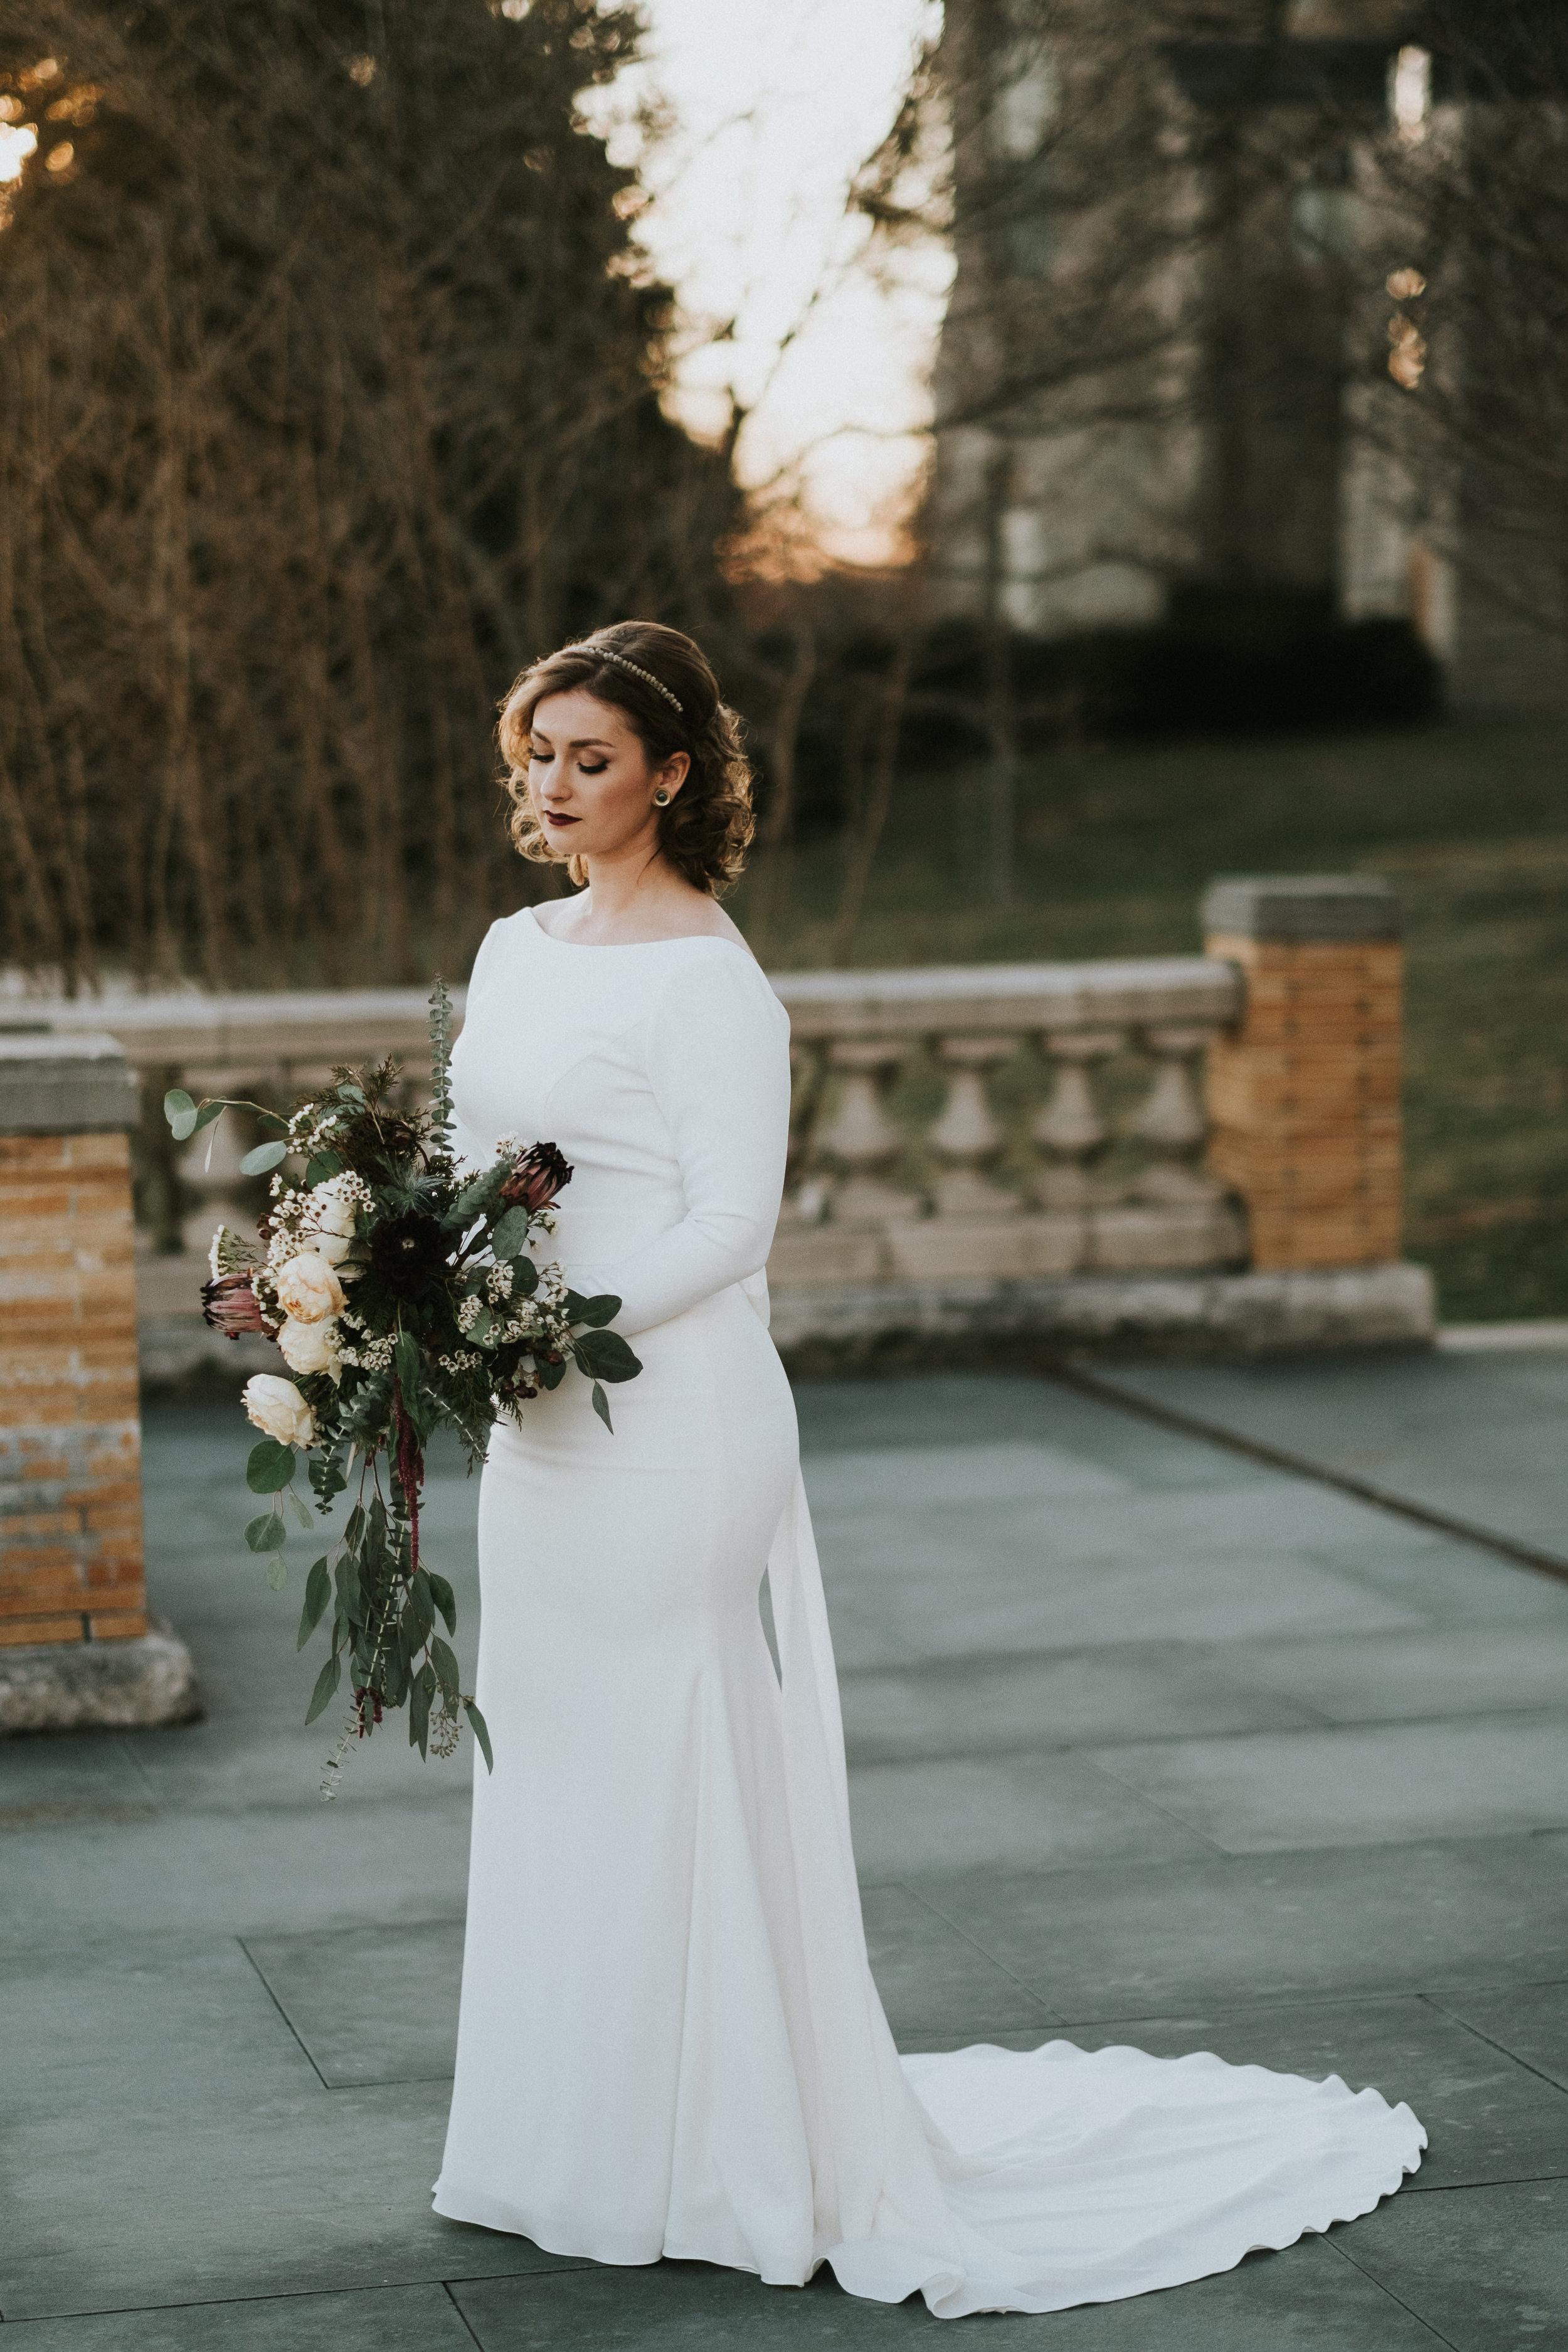 Cairnwood-Estate-Amelia-and-Patrick-Wedding-465.jpg